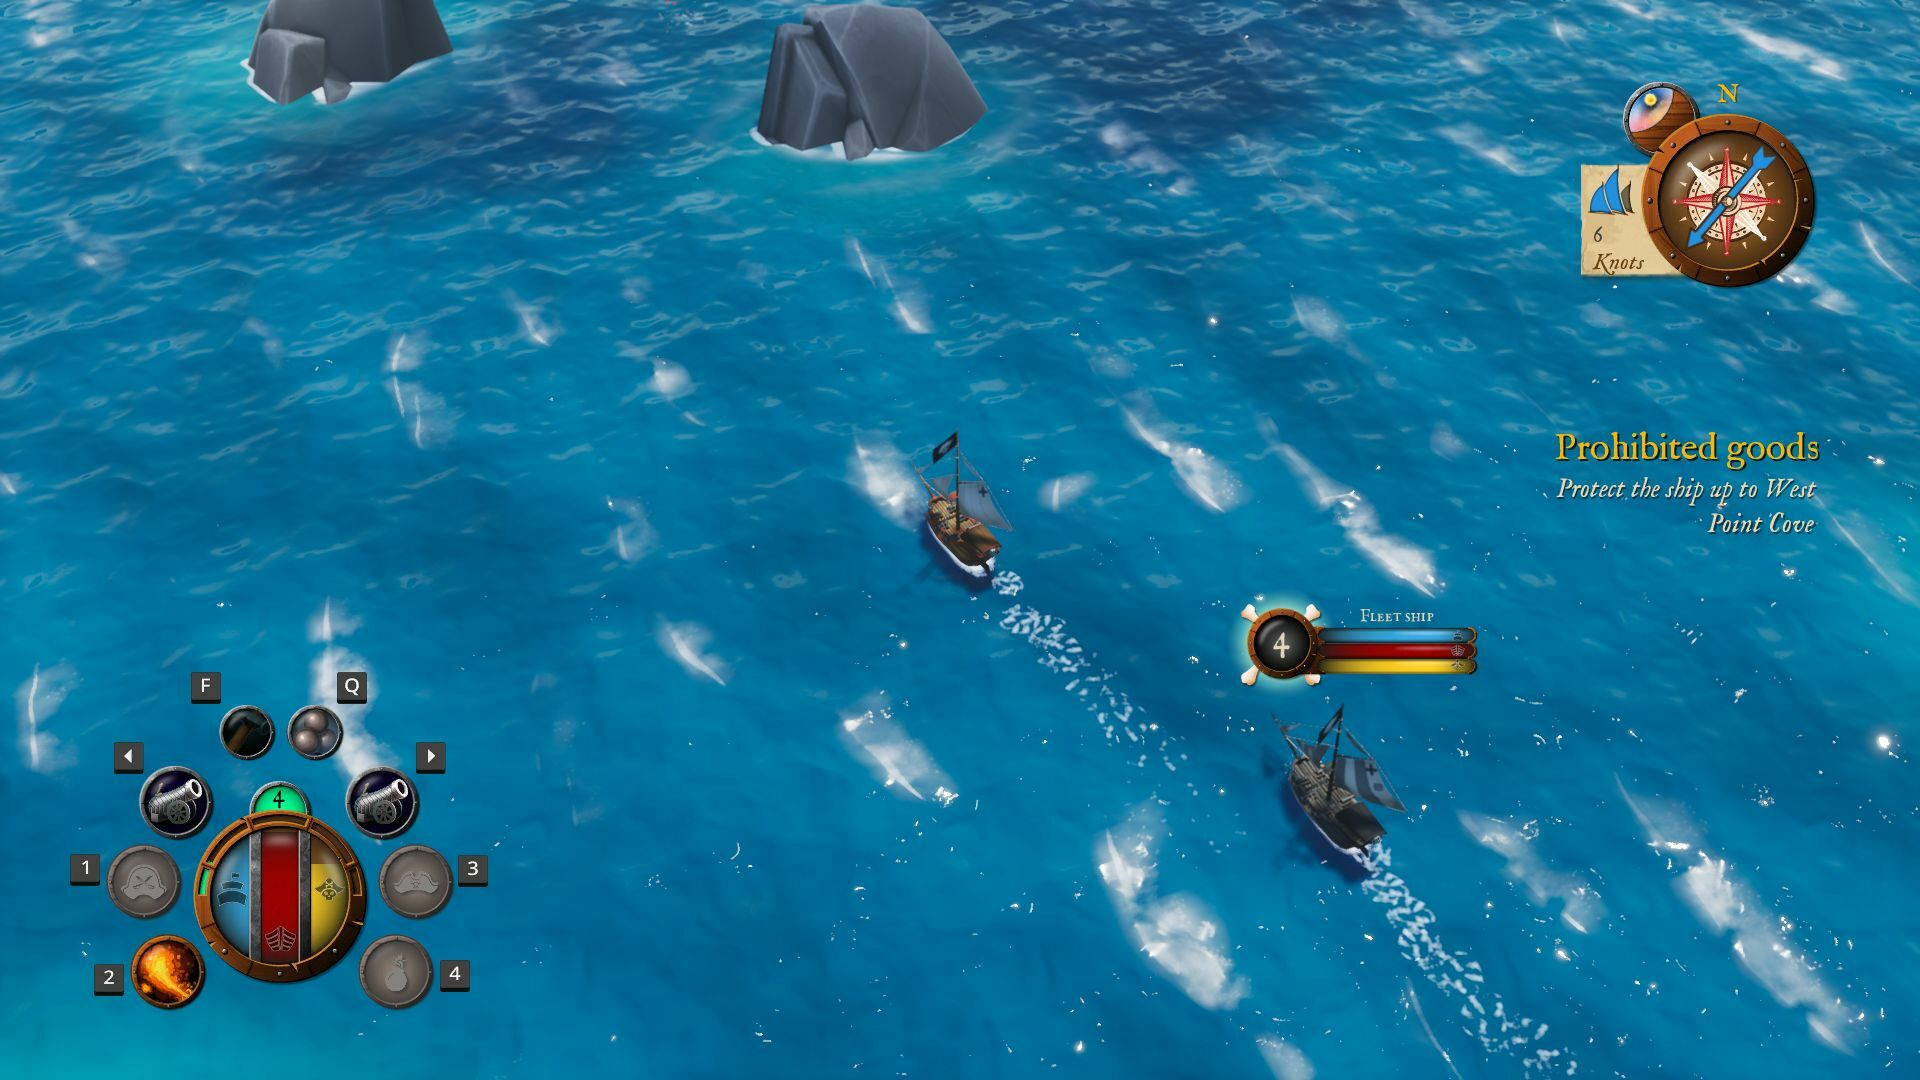 king-of-seas-pc-screenshot-2